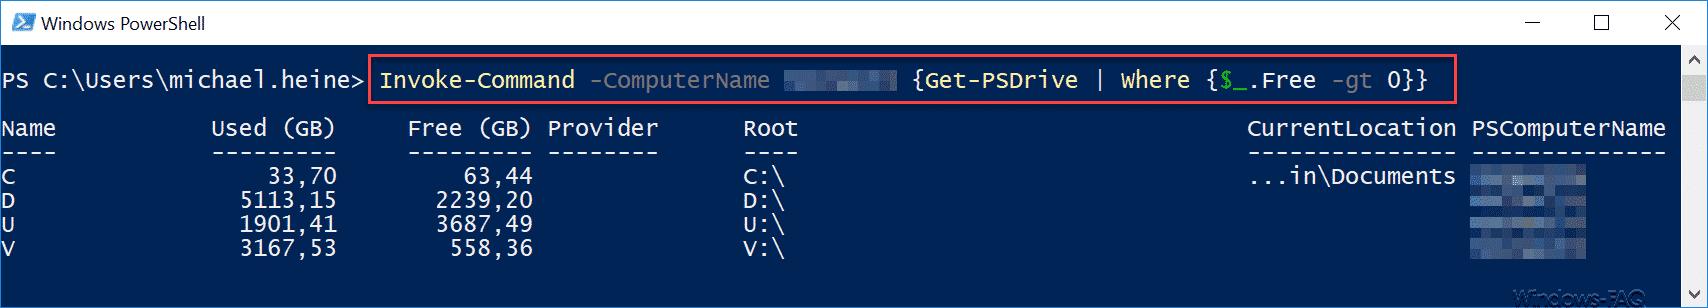 https://www.windows-faq.de/wp-content/uploads/2018/10/Invoke-Command-Get-PSDrive.png